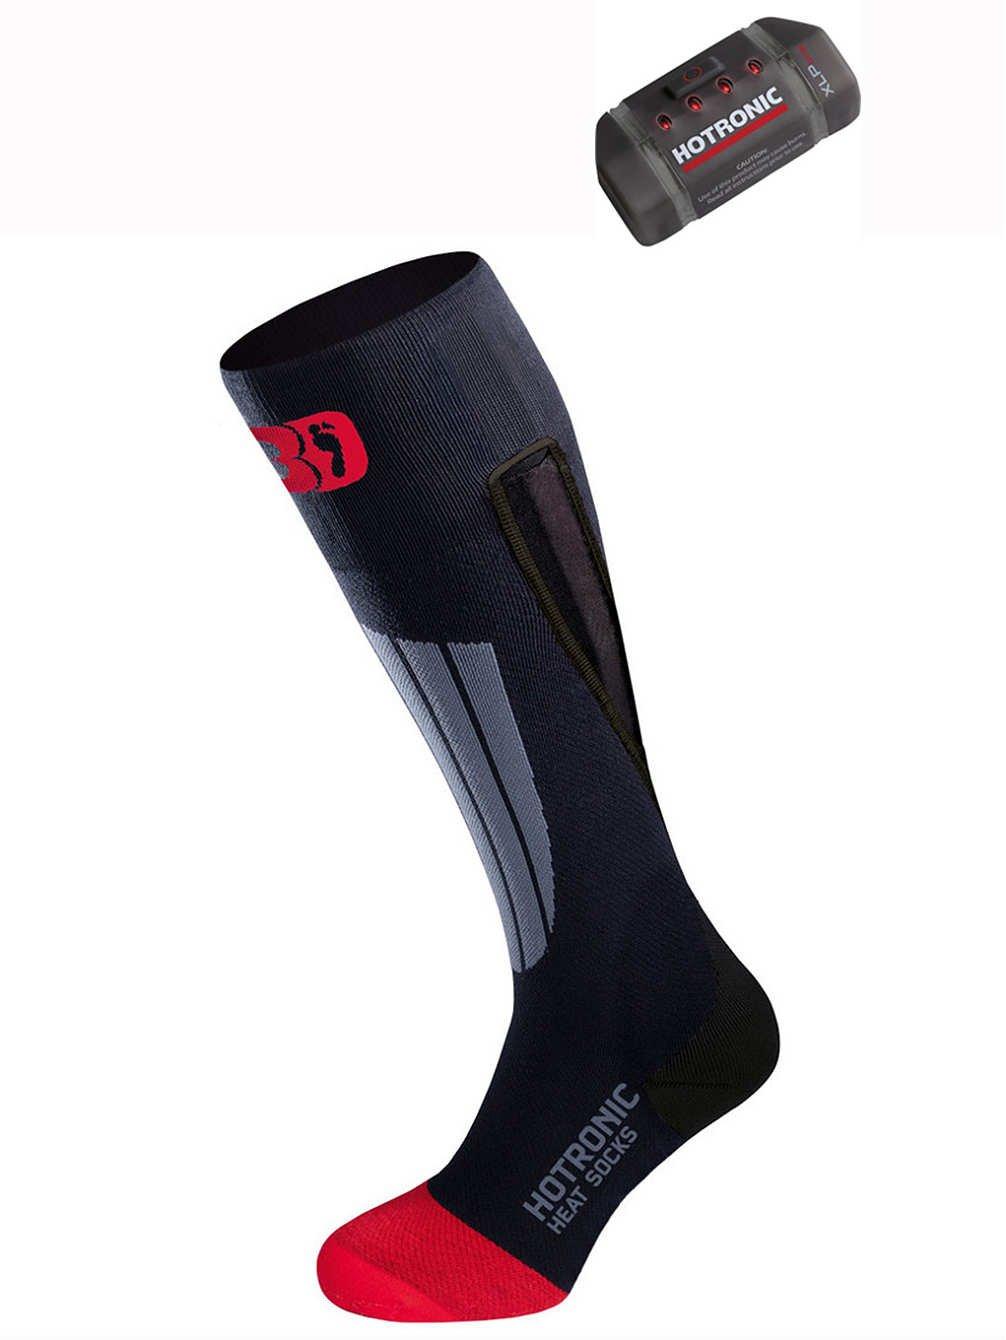 Hotronic XLP ONE Heat Sock Set, Classic, Large